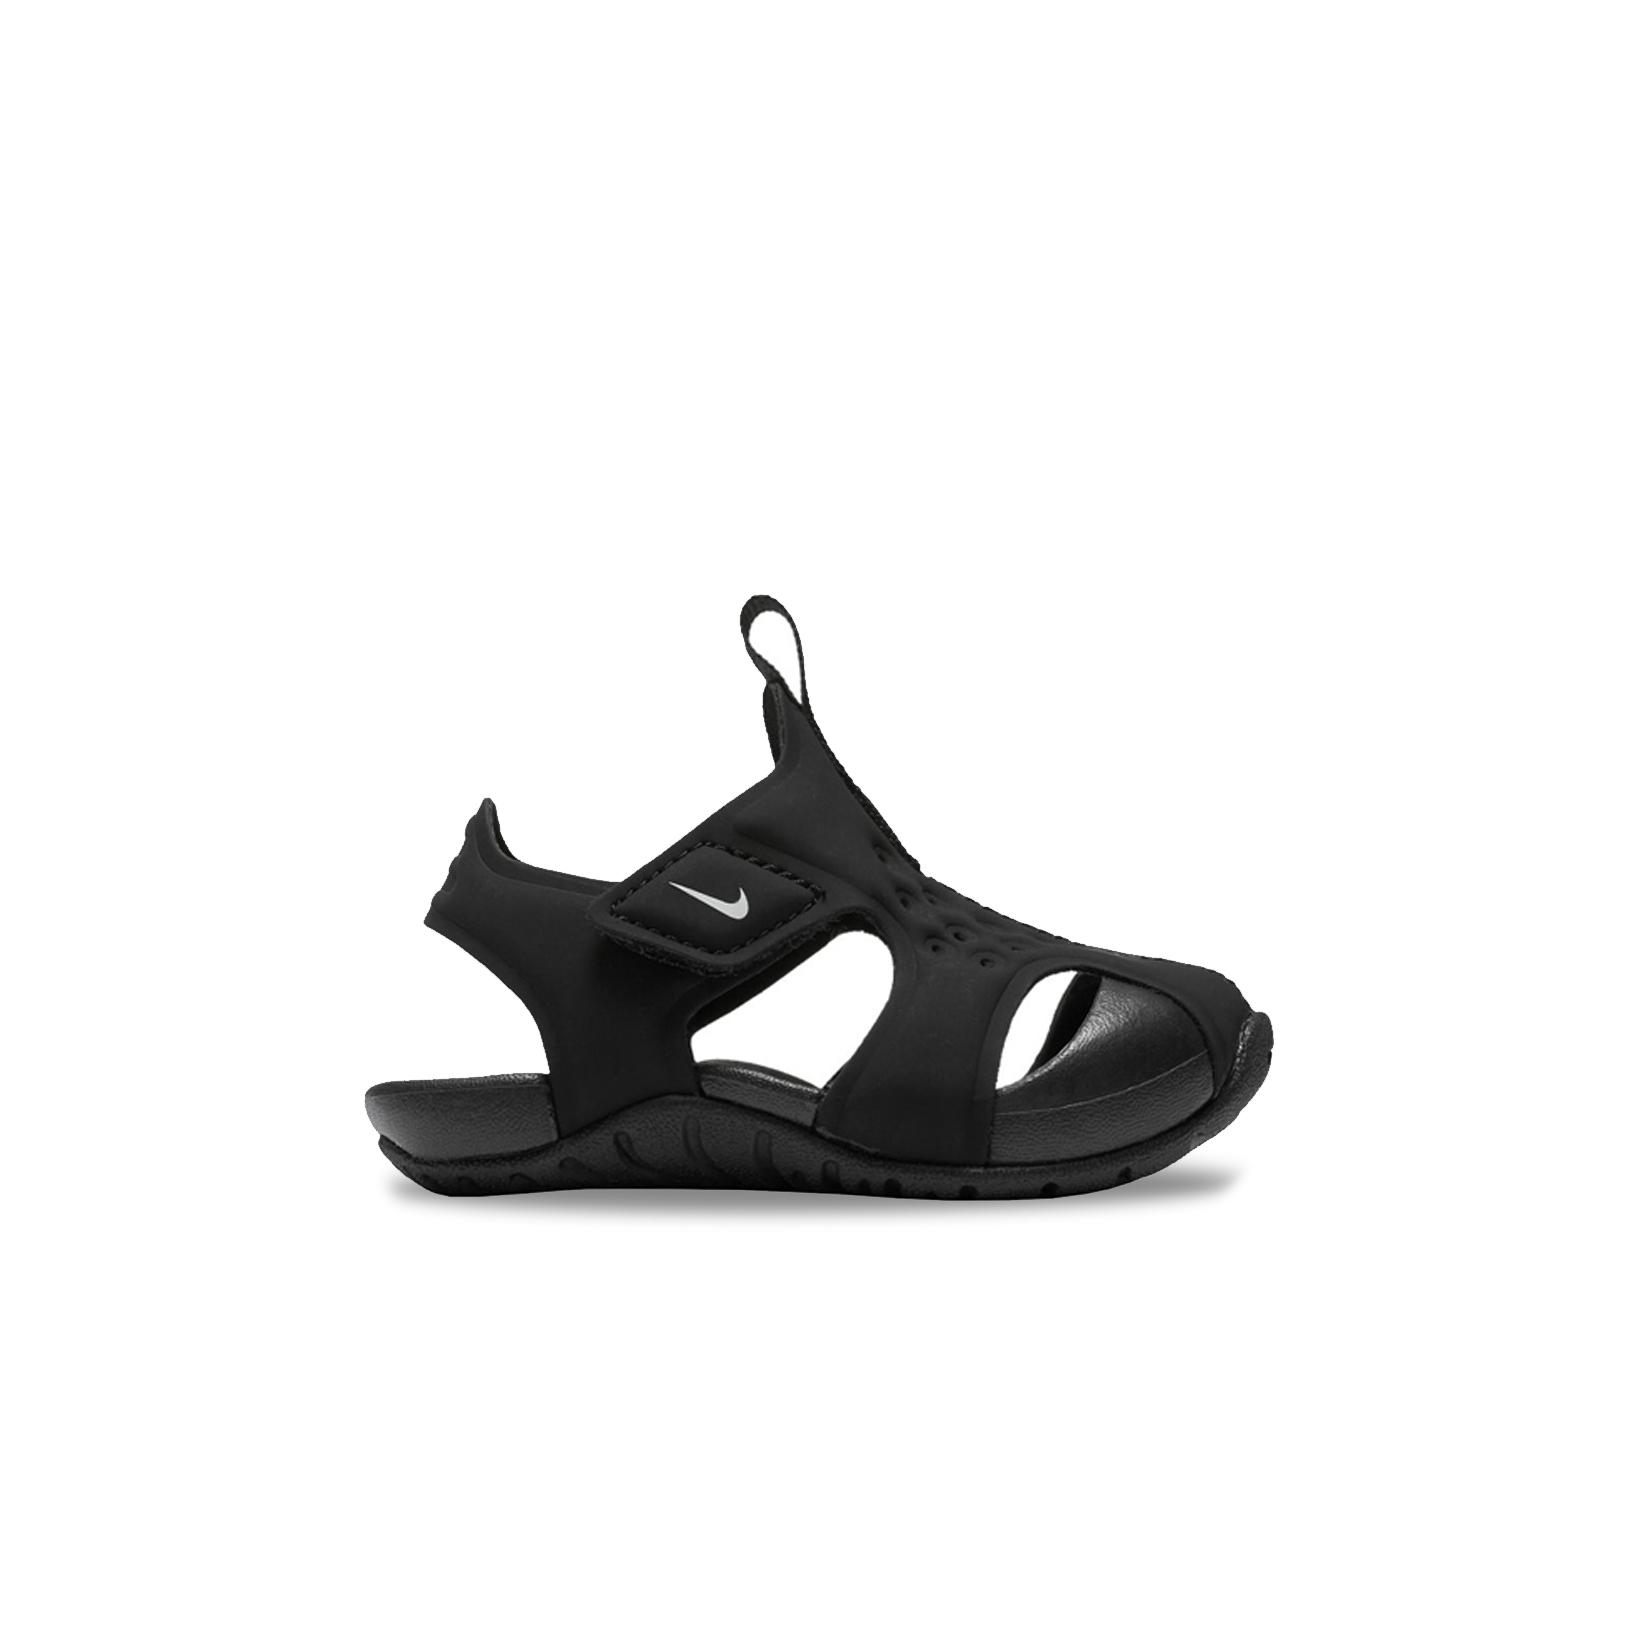 Nike Sunray Protect 2 Sandal Black